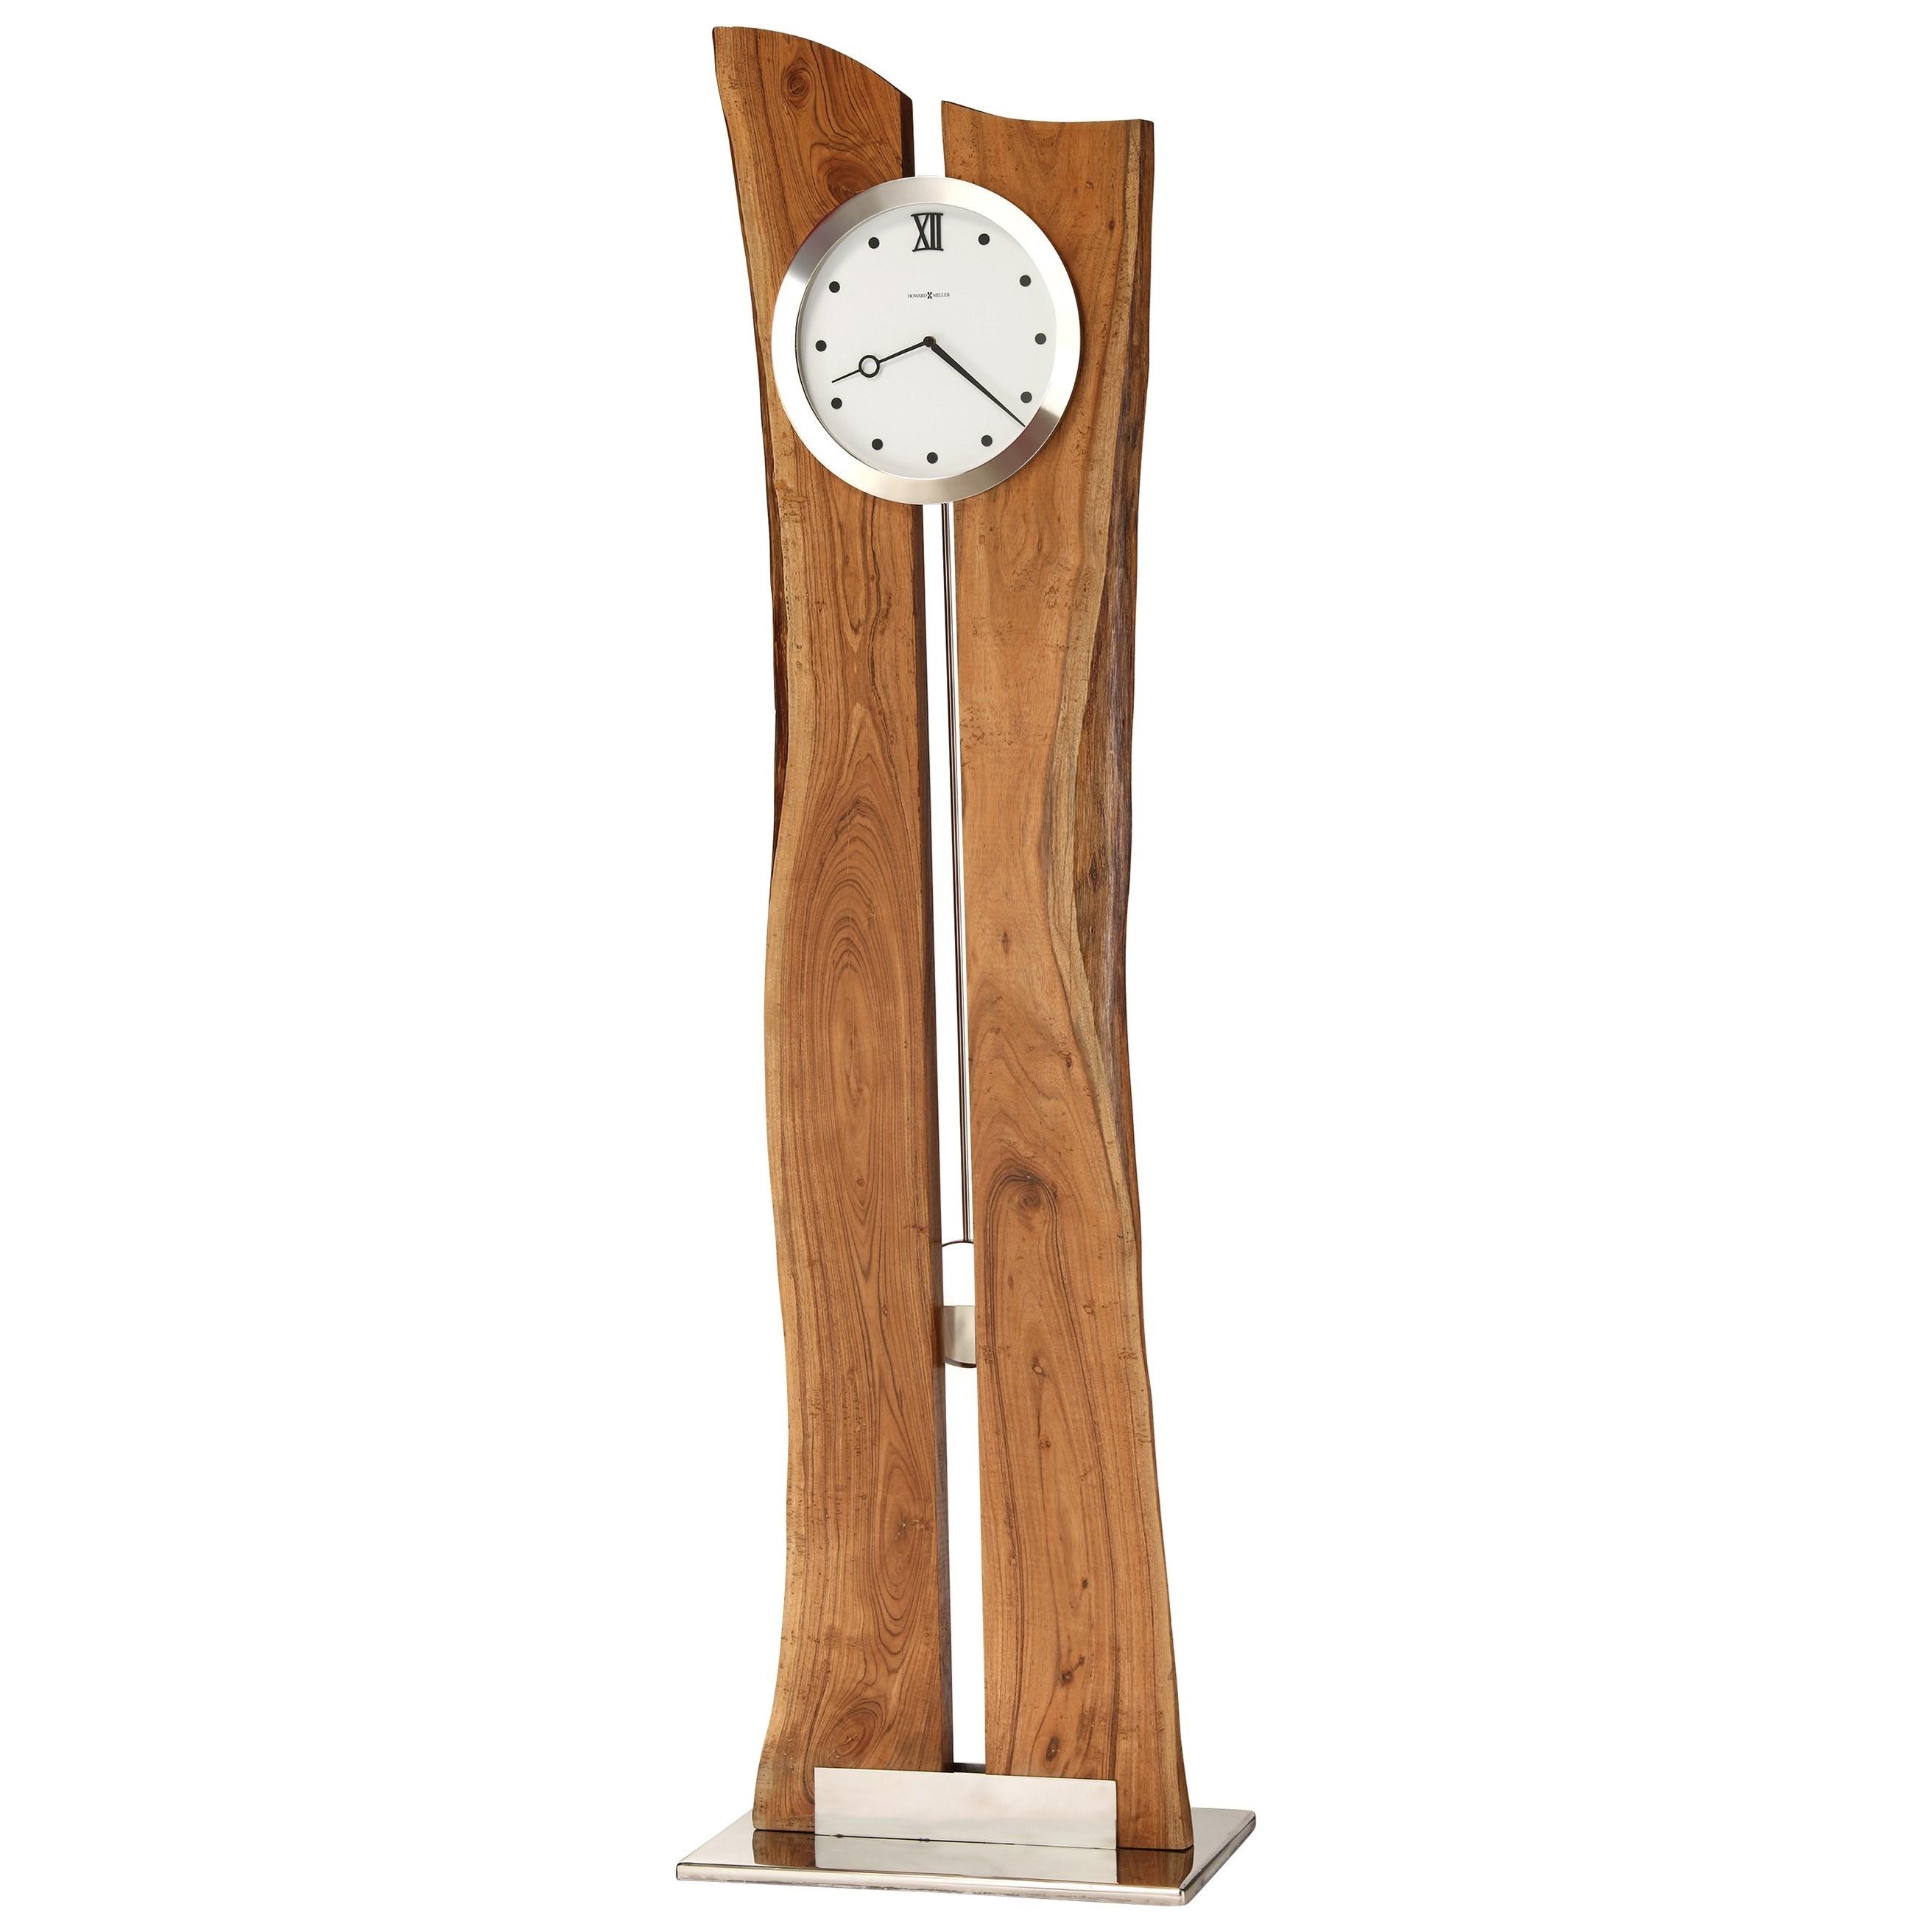 howard miller clocks otto driftwood floor clock - Howard Miller Grandfather Clock